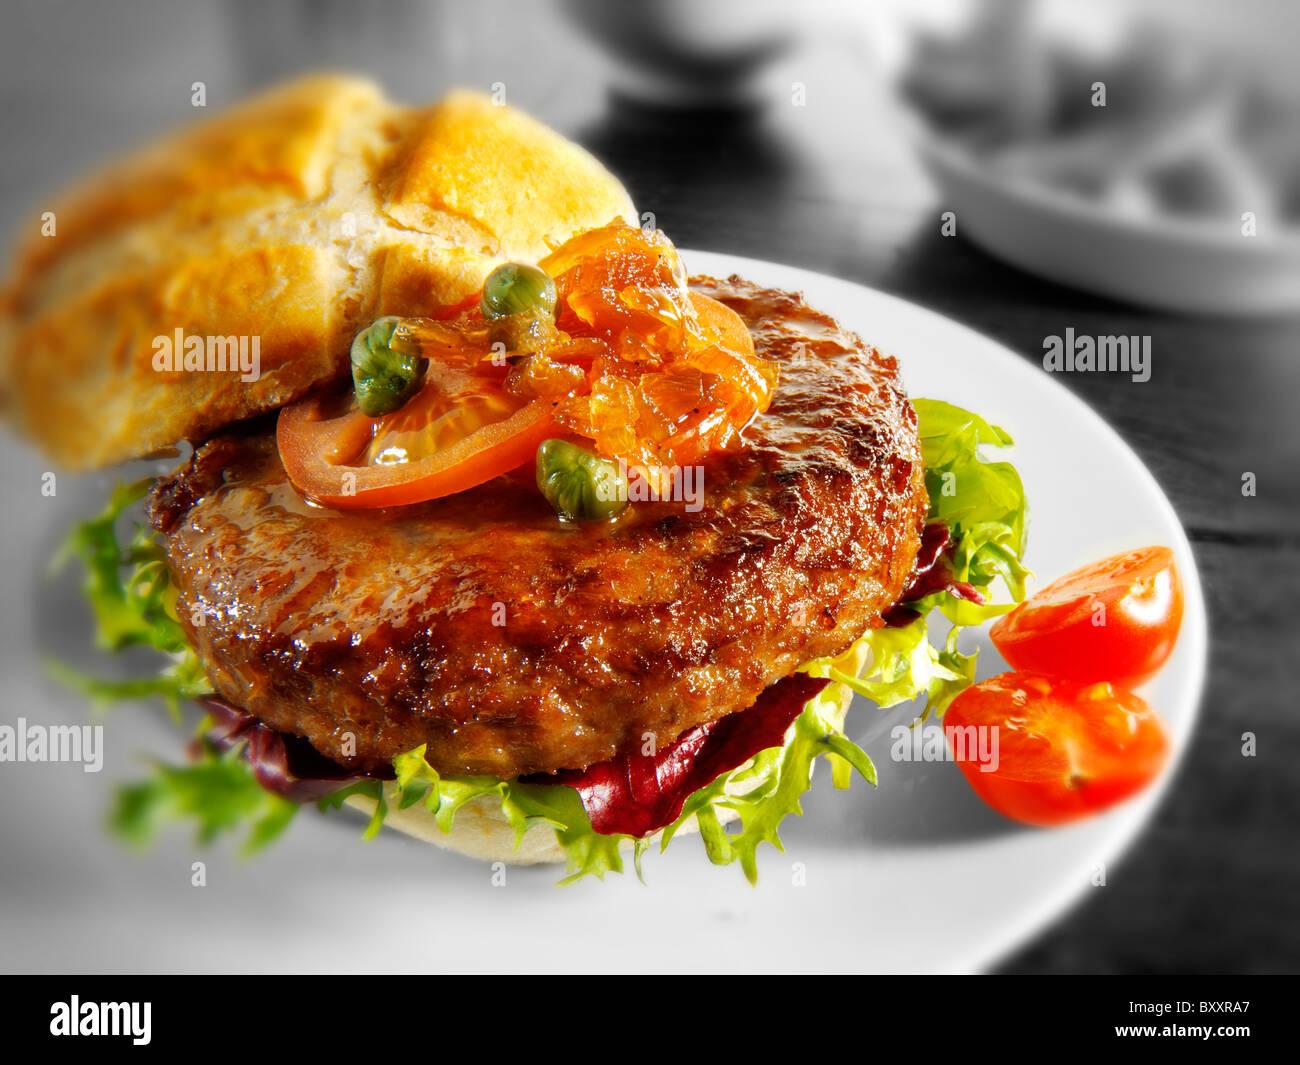 Hamburger mit Bub und lustvoll Stockbild